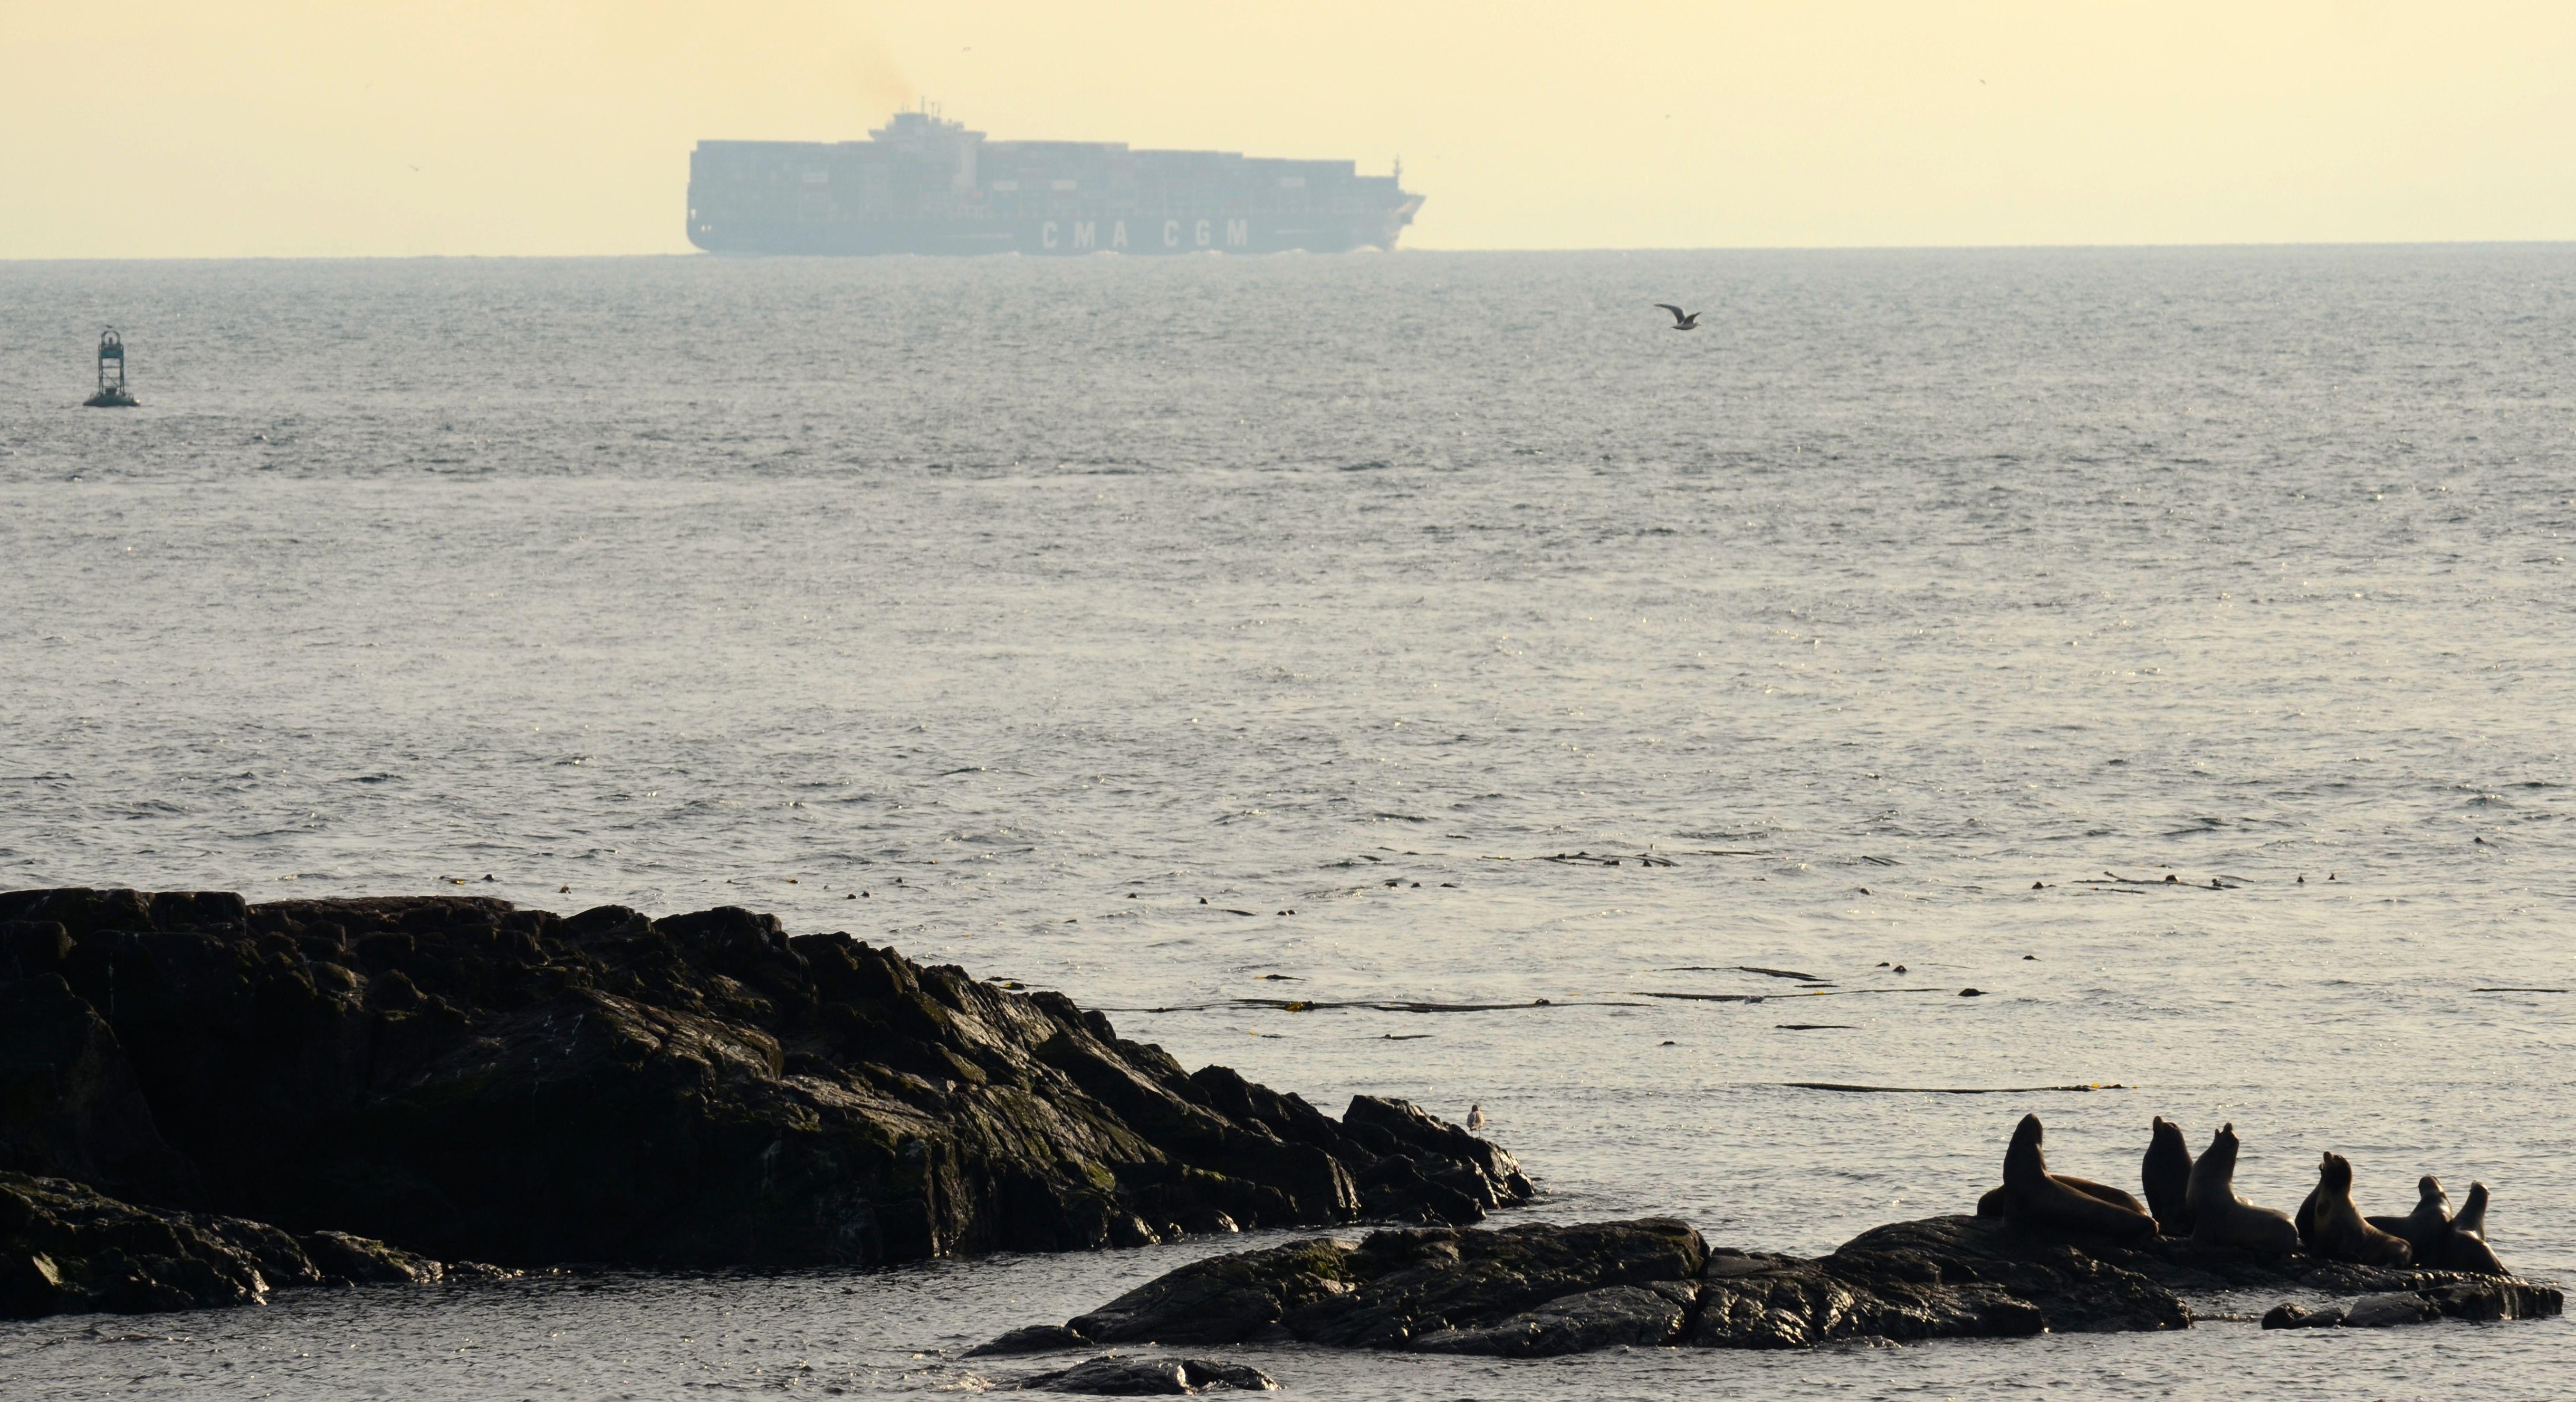 The 335m long cargo ship CMA CGM Bianca passes a few kilometres southeast of Race Rocks.